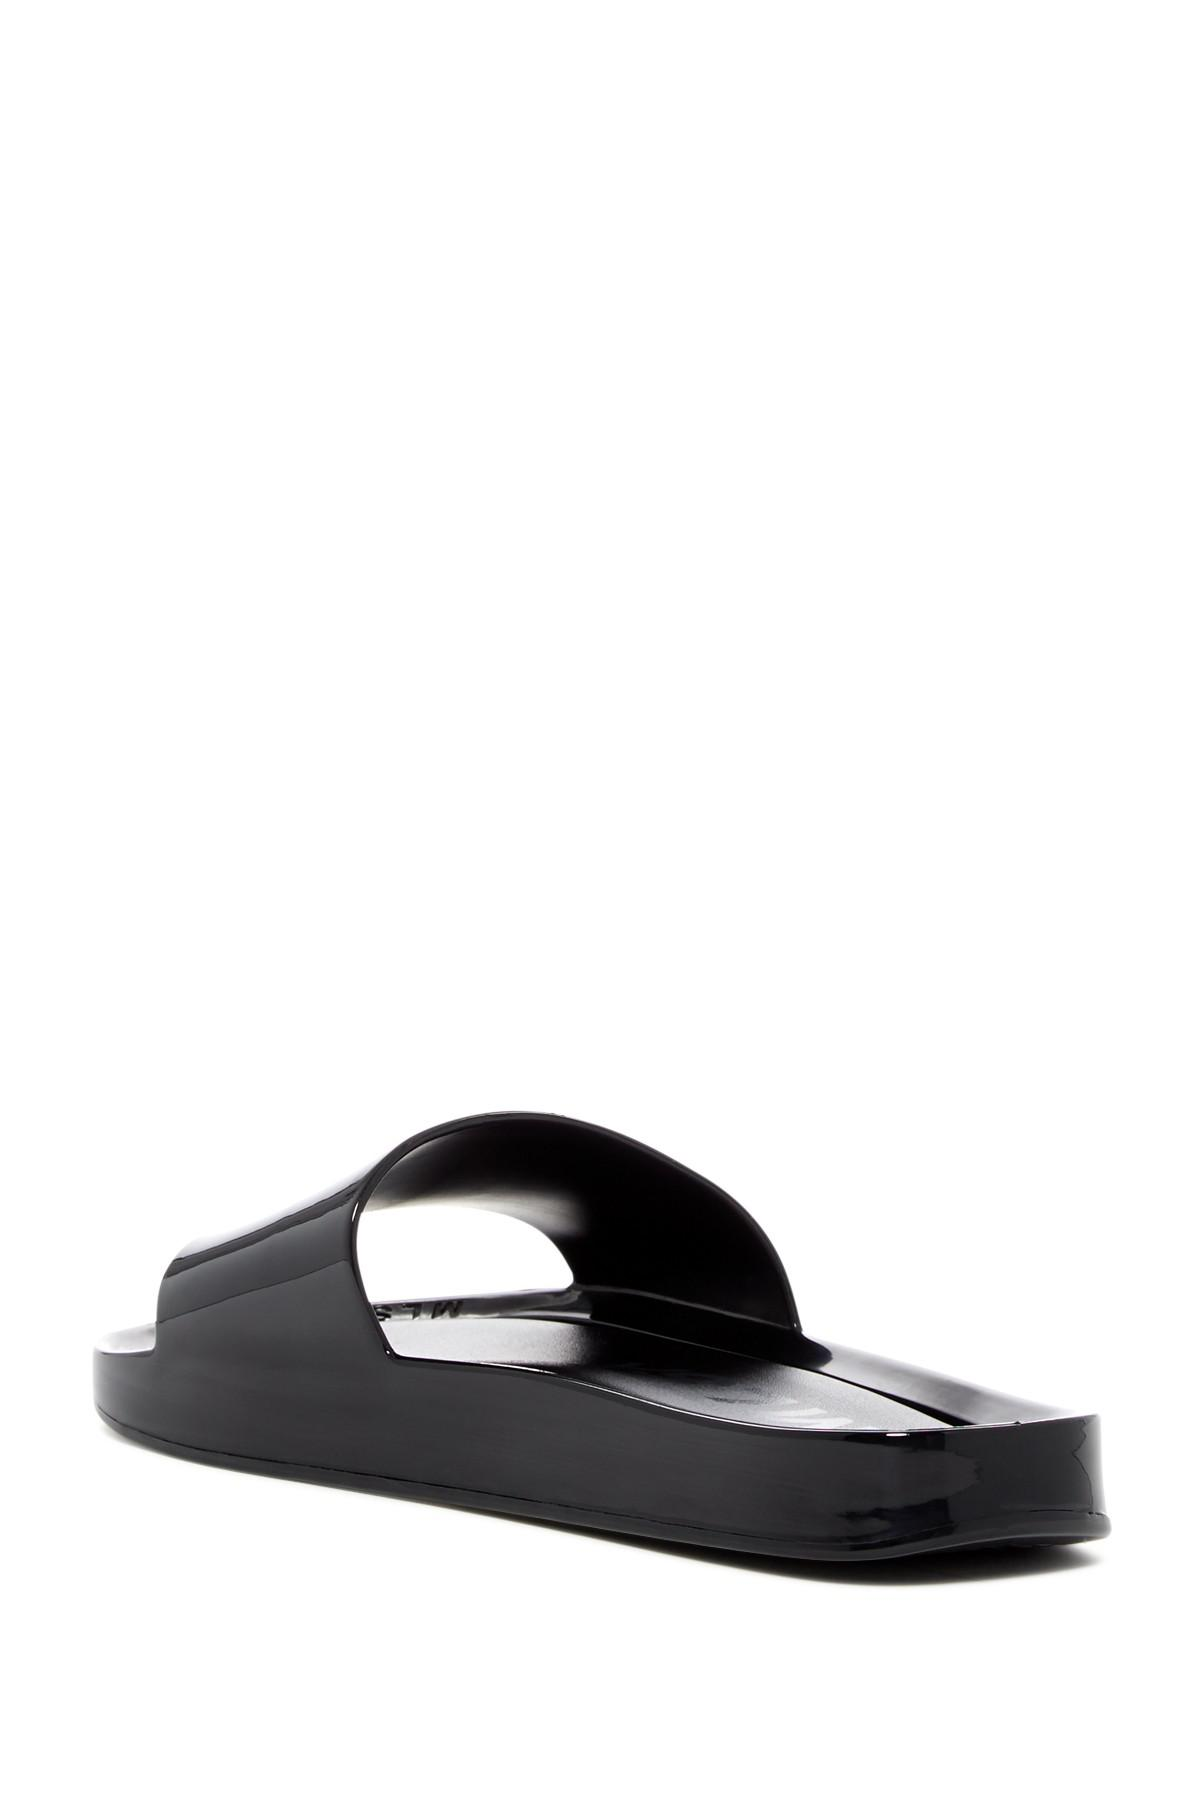 c7395304ea9 Lyst - Melissa Beach Slide Sandal (women) in Black